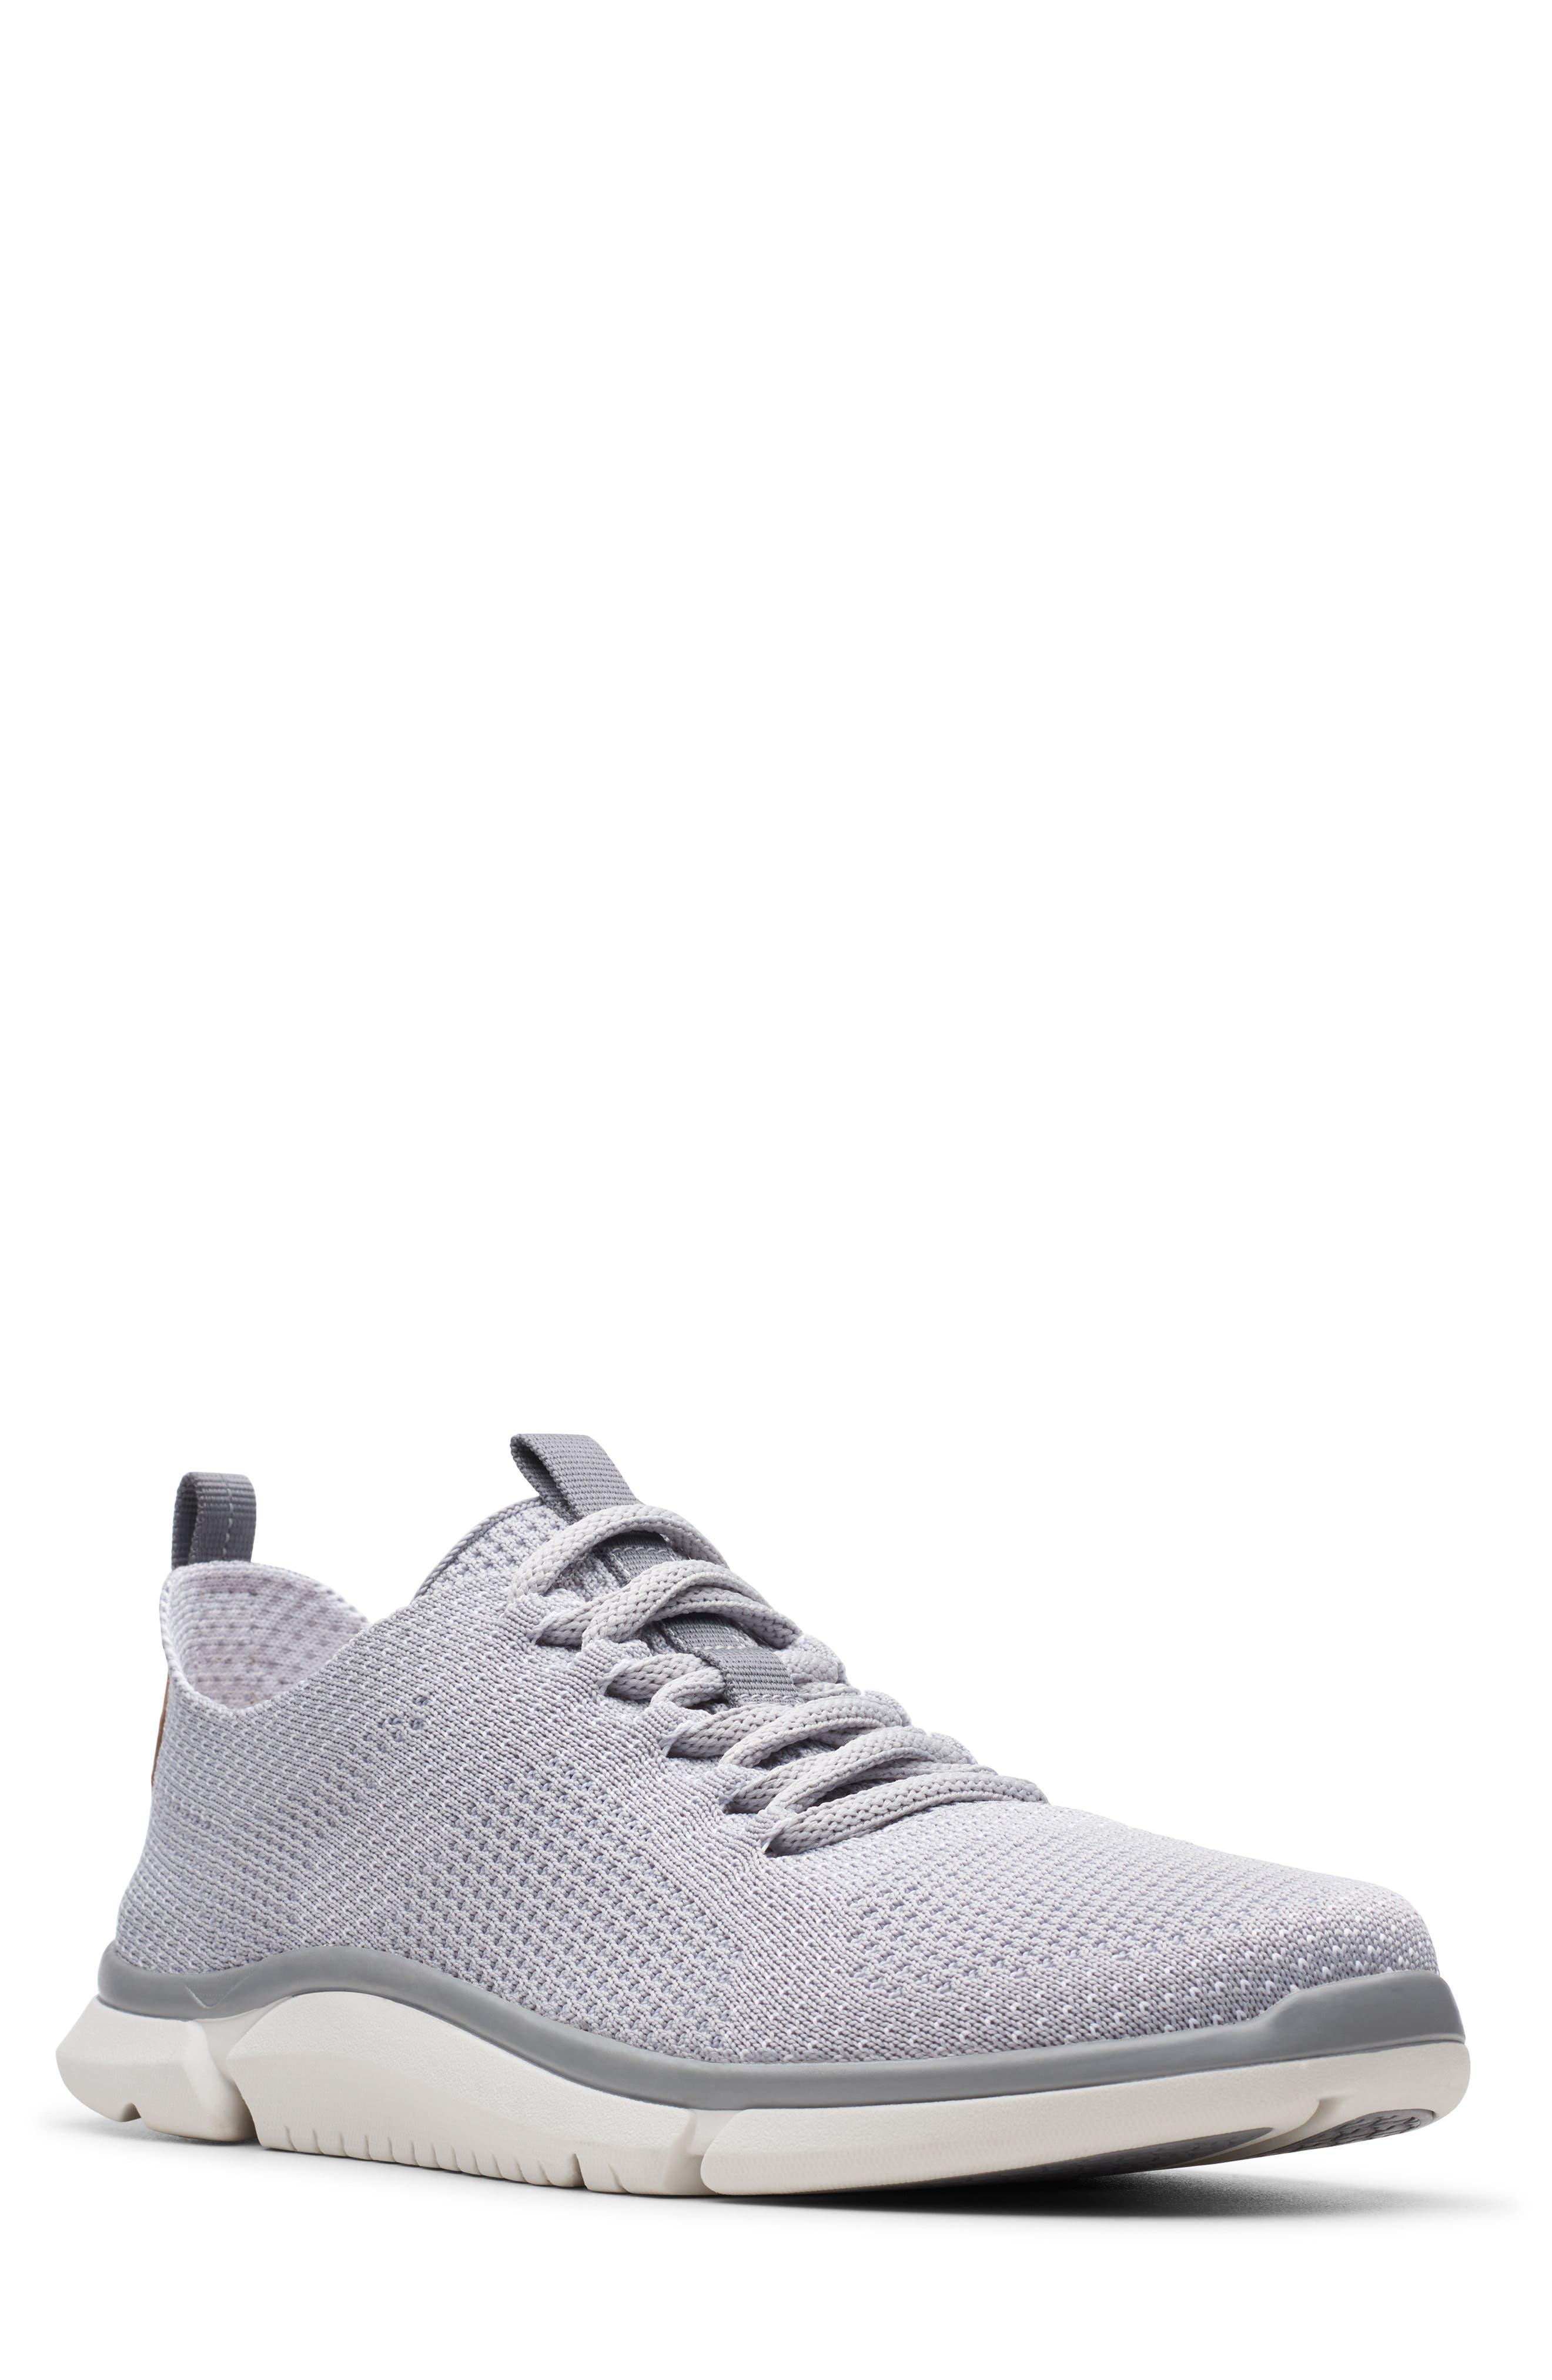 CLARKS<SUP>®</SUP> Triken Run Sneaker, Main, color, GREY